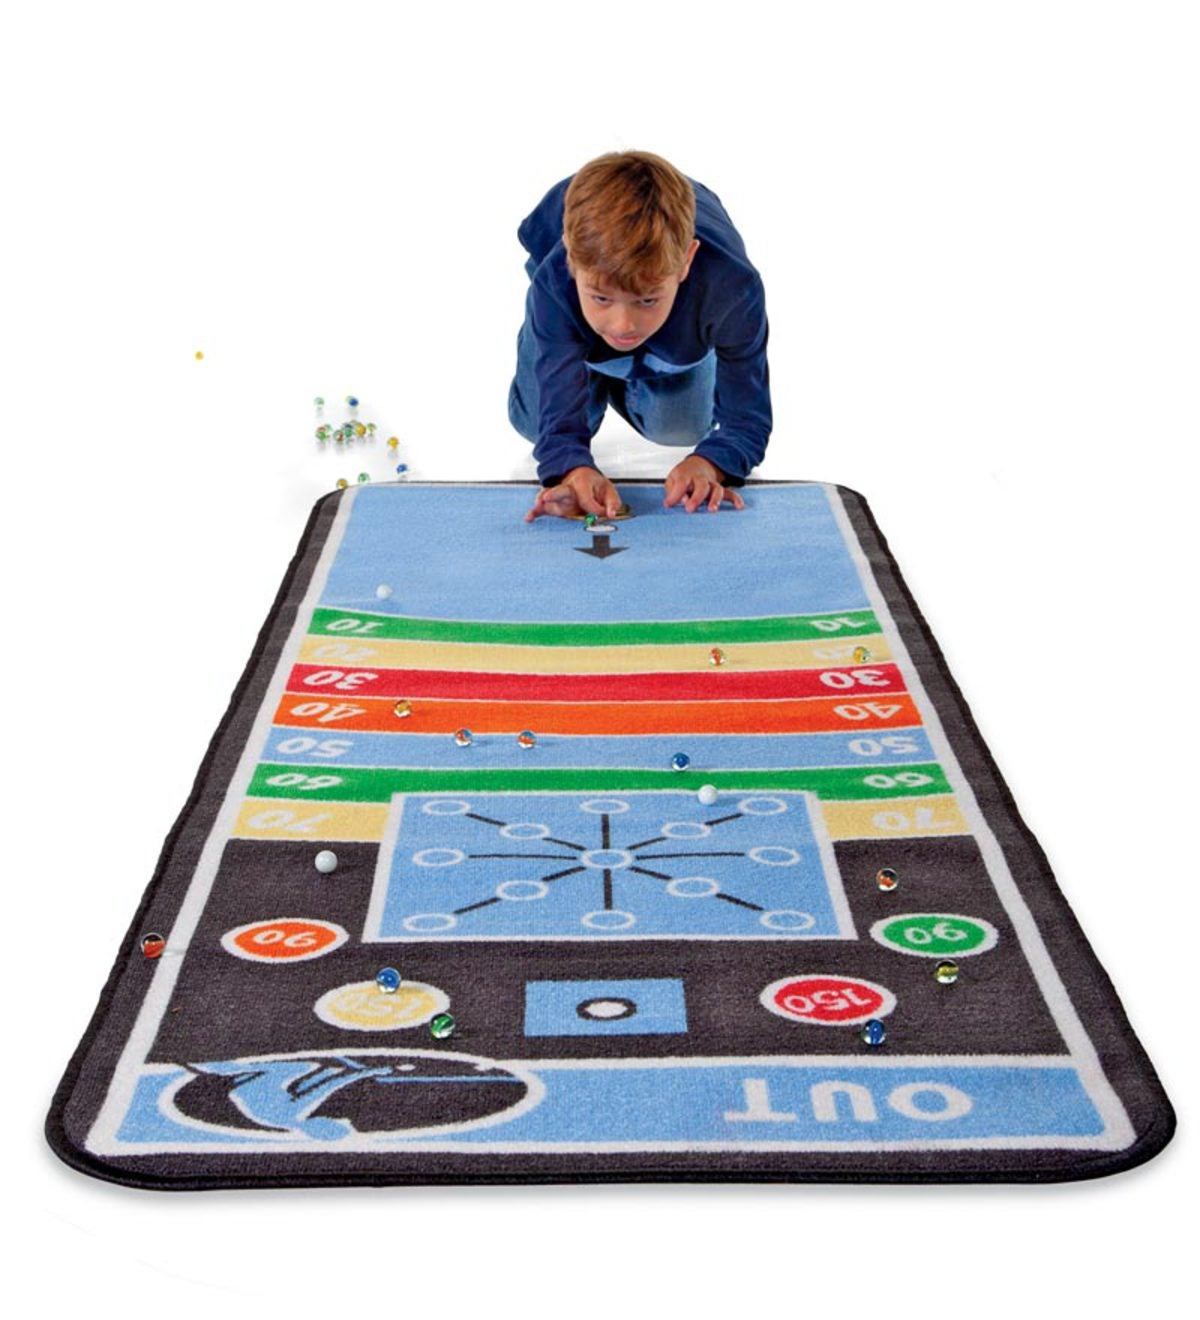 decorative play mat.htm marble aim game mat with marbles plowhearth  marble aim game mat with marbles